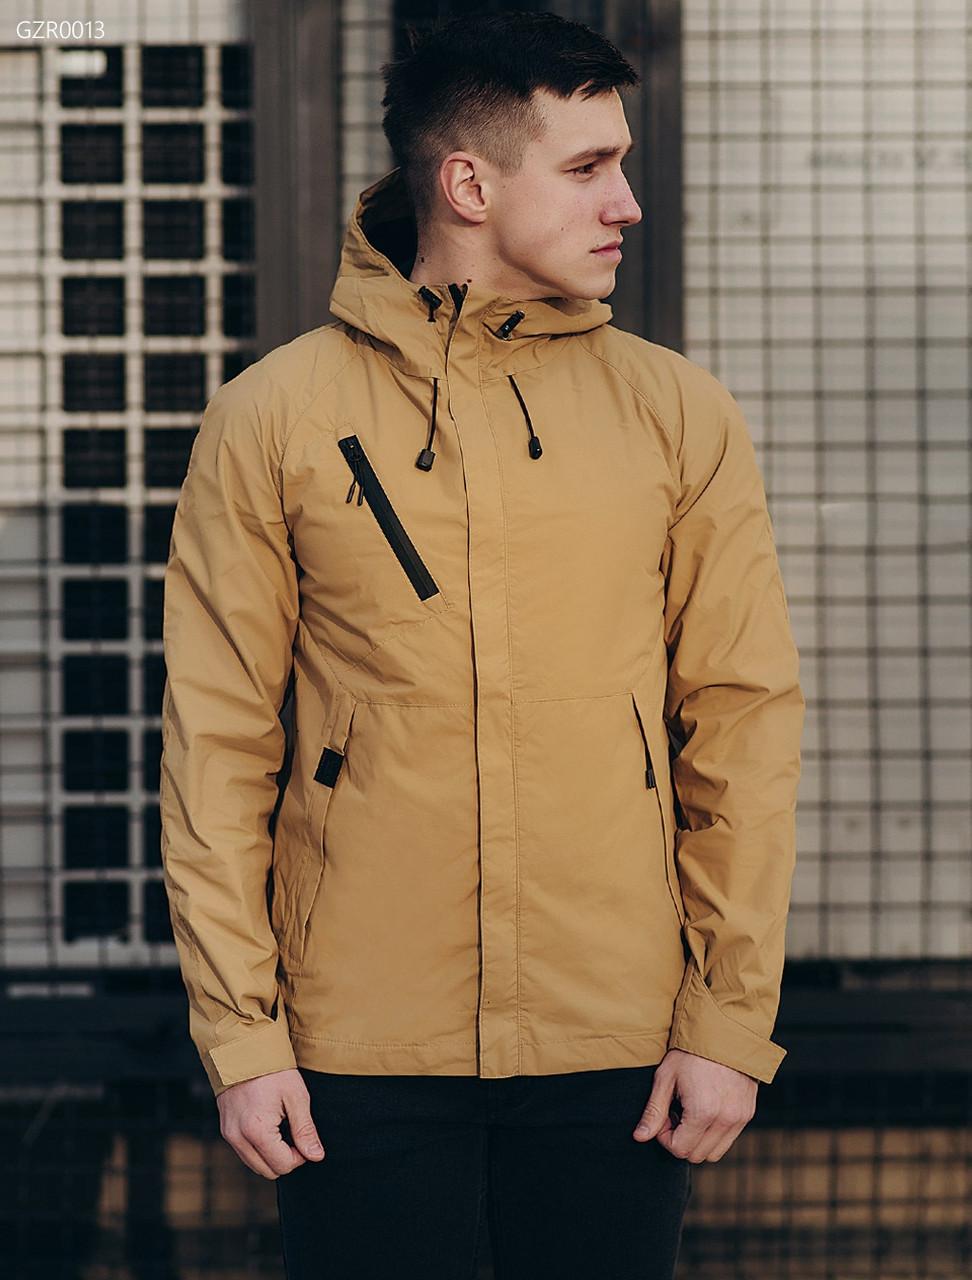 6c5f14da442 Мужская молодежная весенняя куртка (стаф) Staff windstorm beige GZR0013 -  интернет-магазин